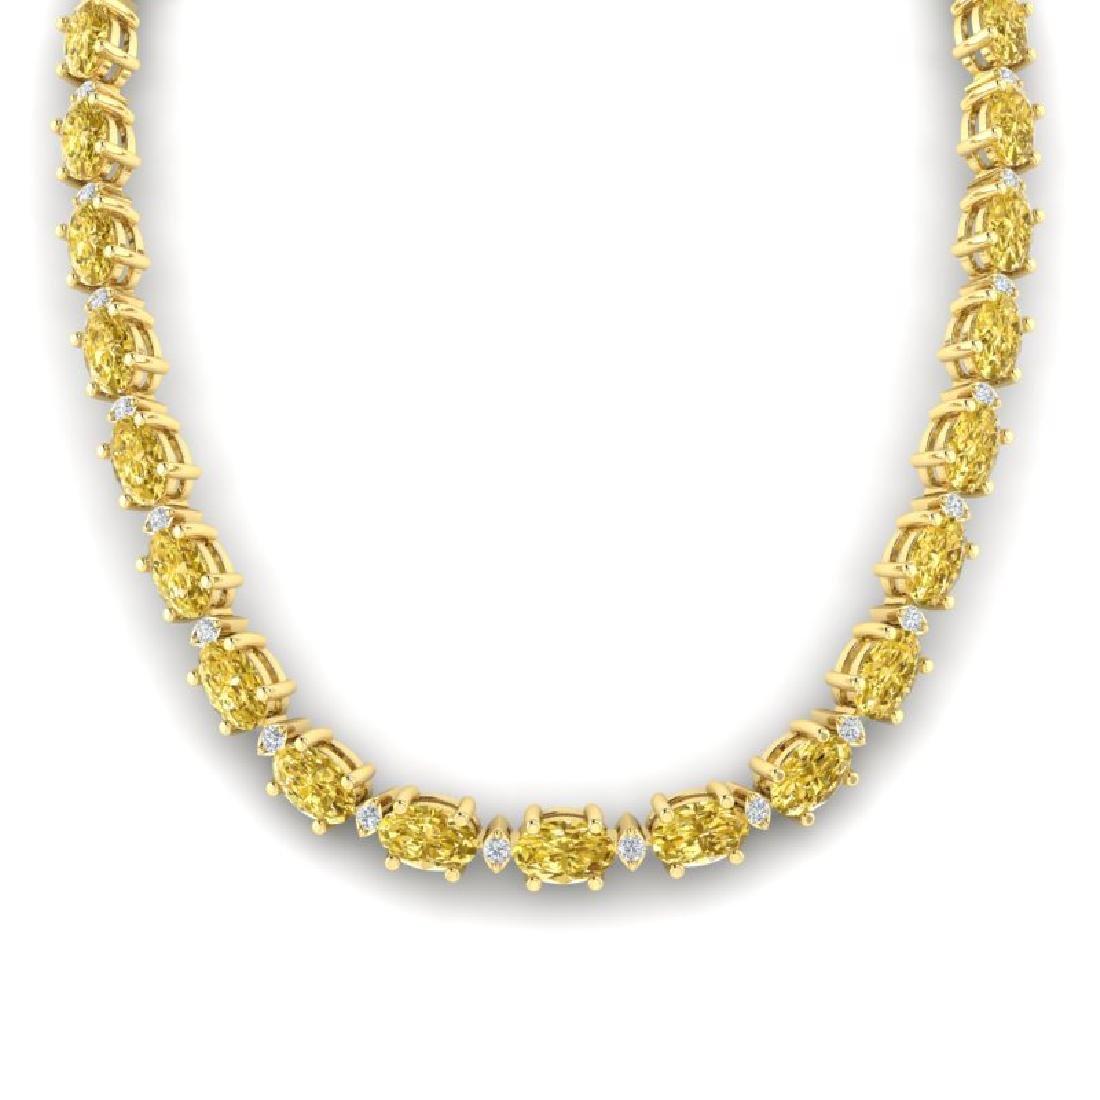 28 CTW Citrine & VS/SI Diamond Eternity Tennis Necklace - 3